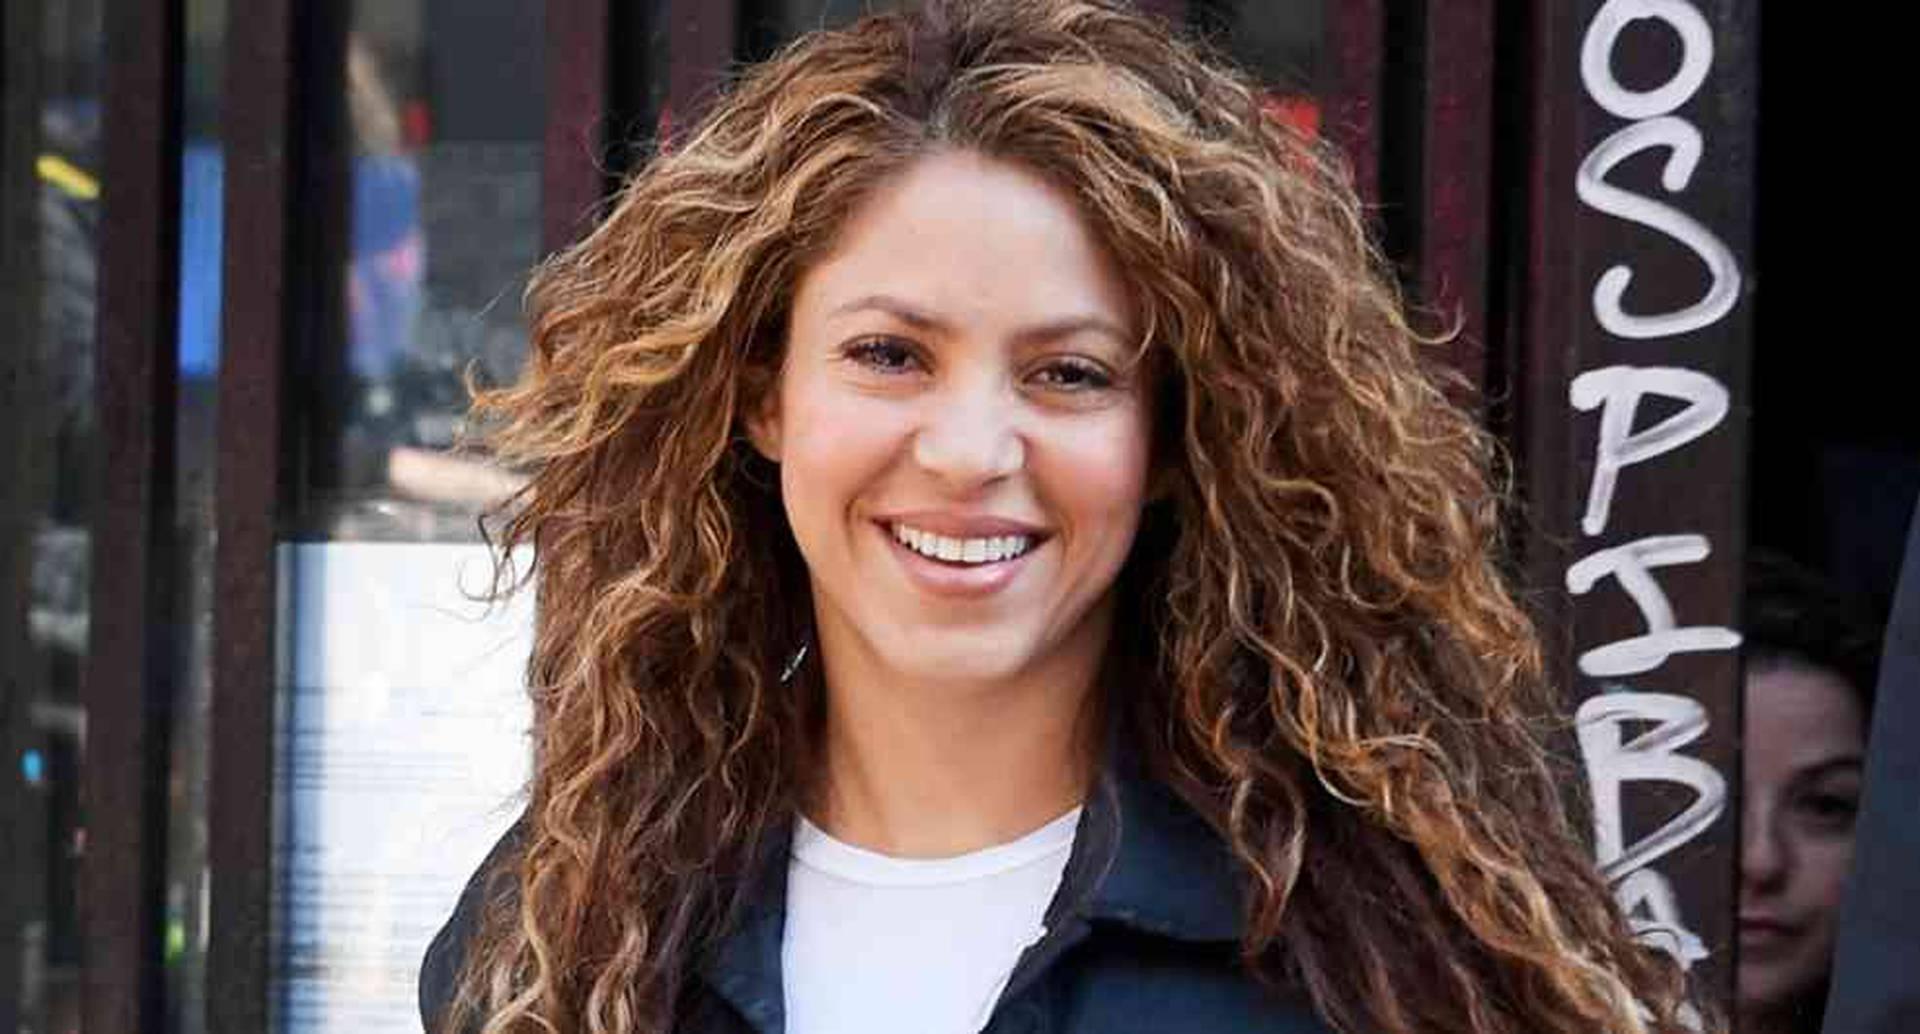 Shakira, la famosa cantante colombiana, pidió a sus seguidores ir a votar con tapabocas.